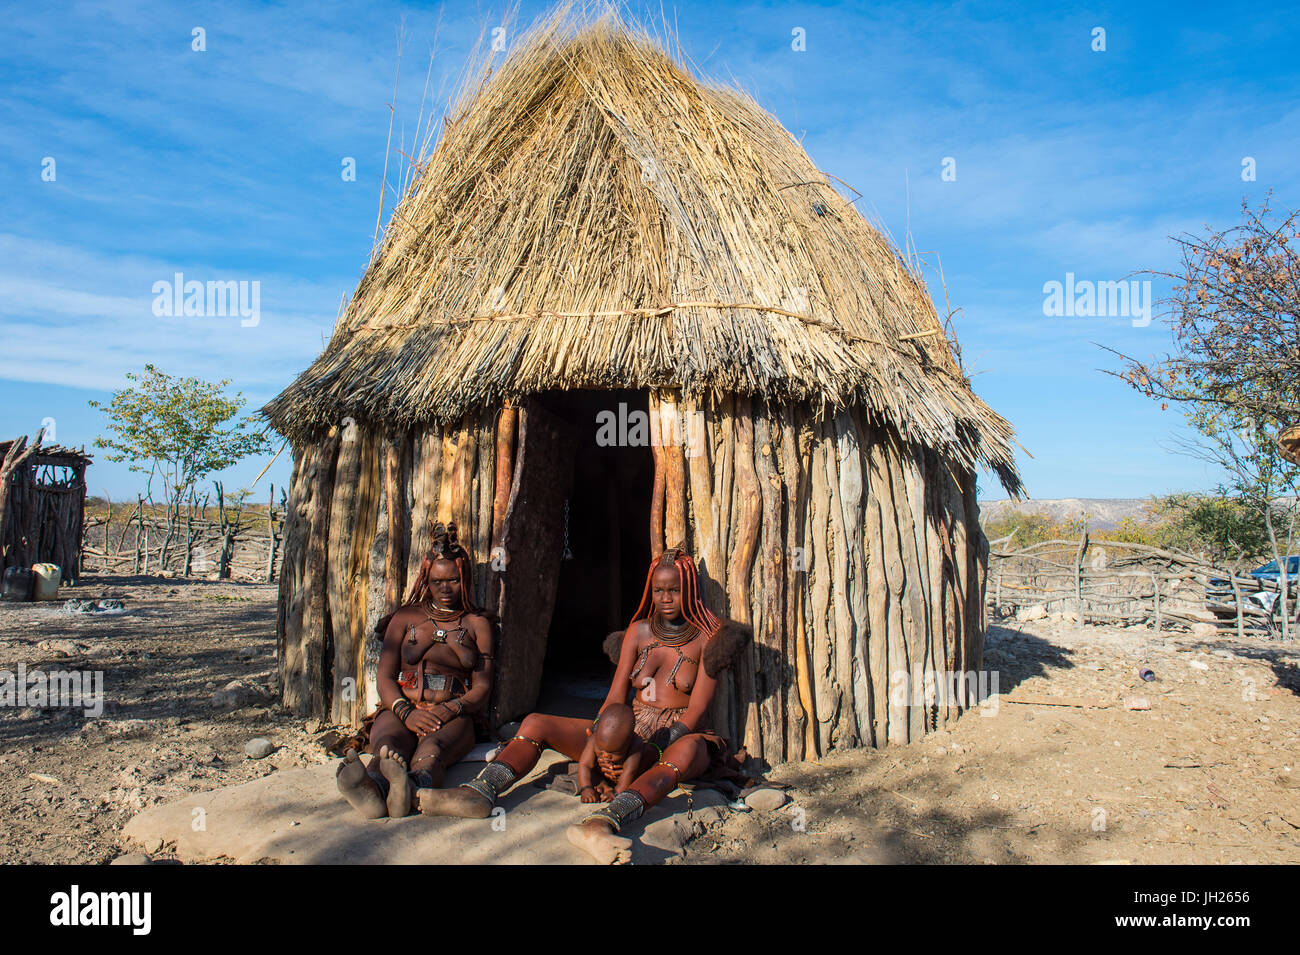 Las mujeres Himba delante de su cabaña, Kaokoland, Namibia, África Imagen De Stock